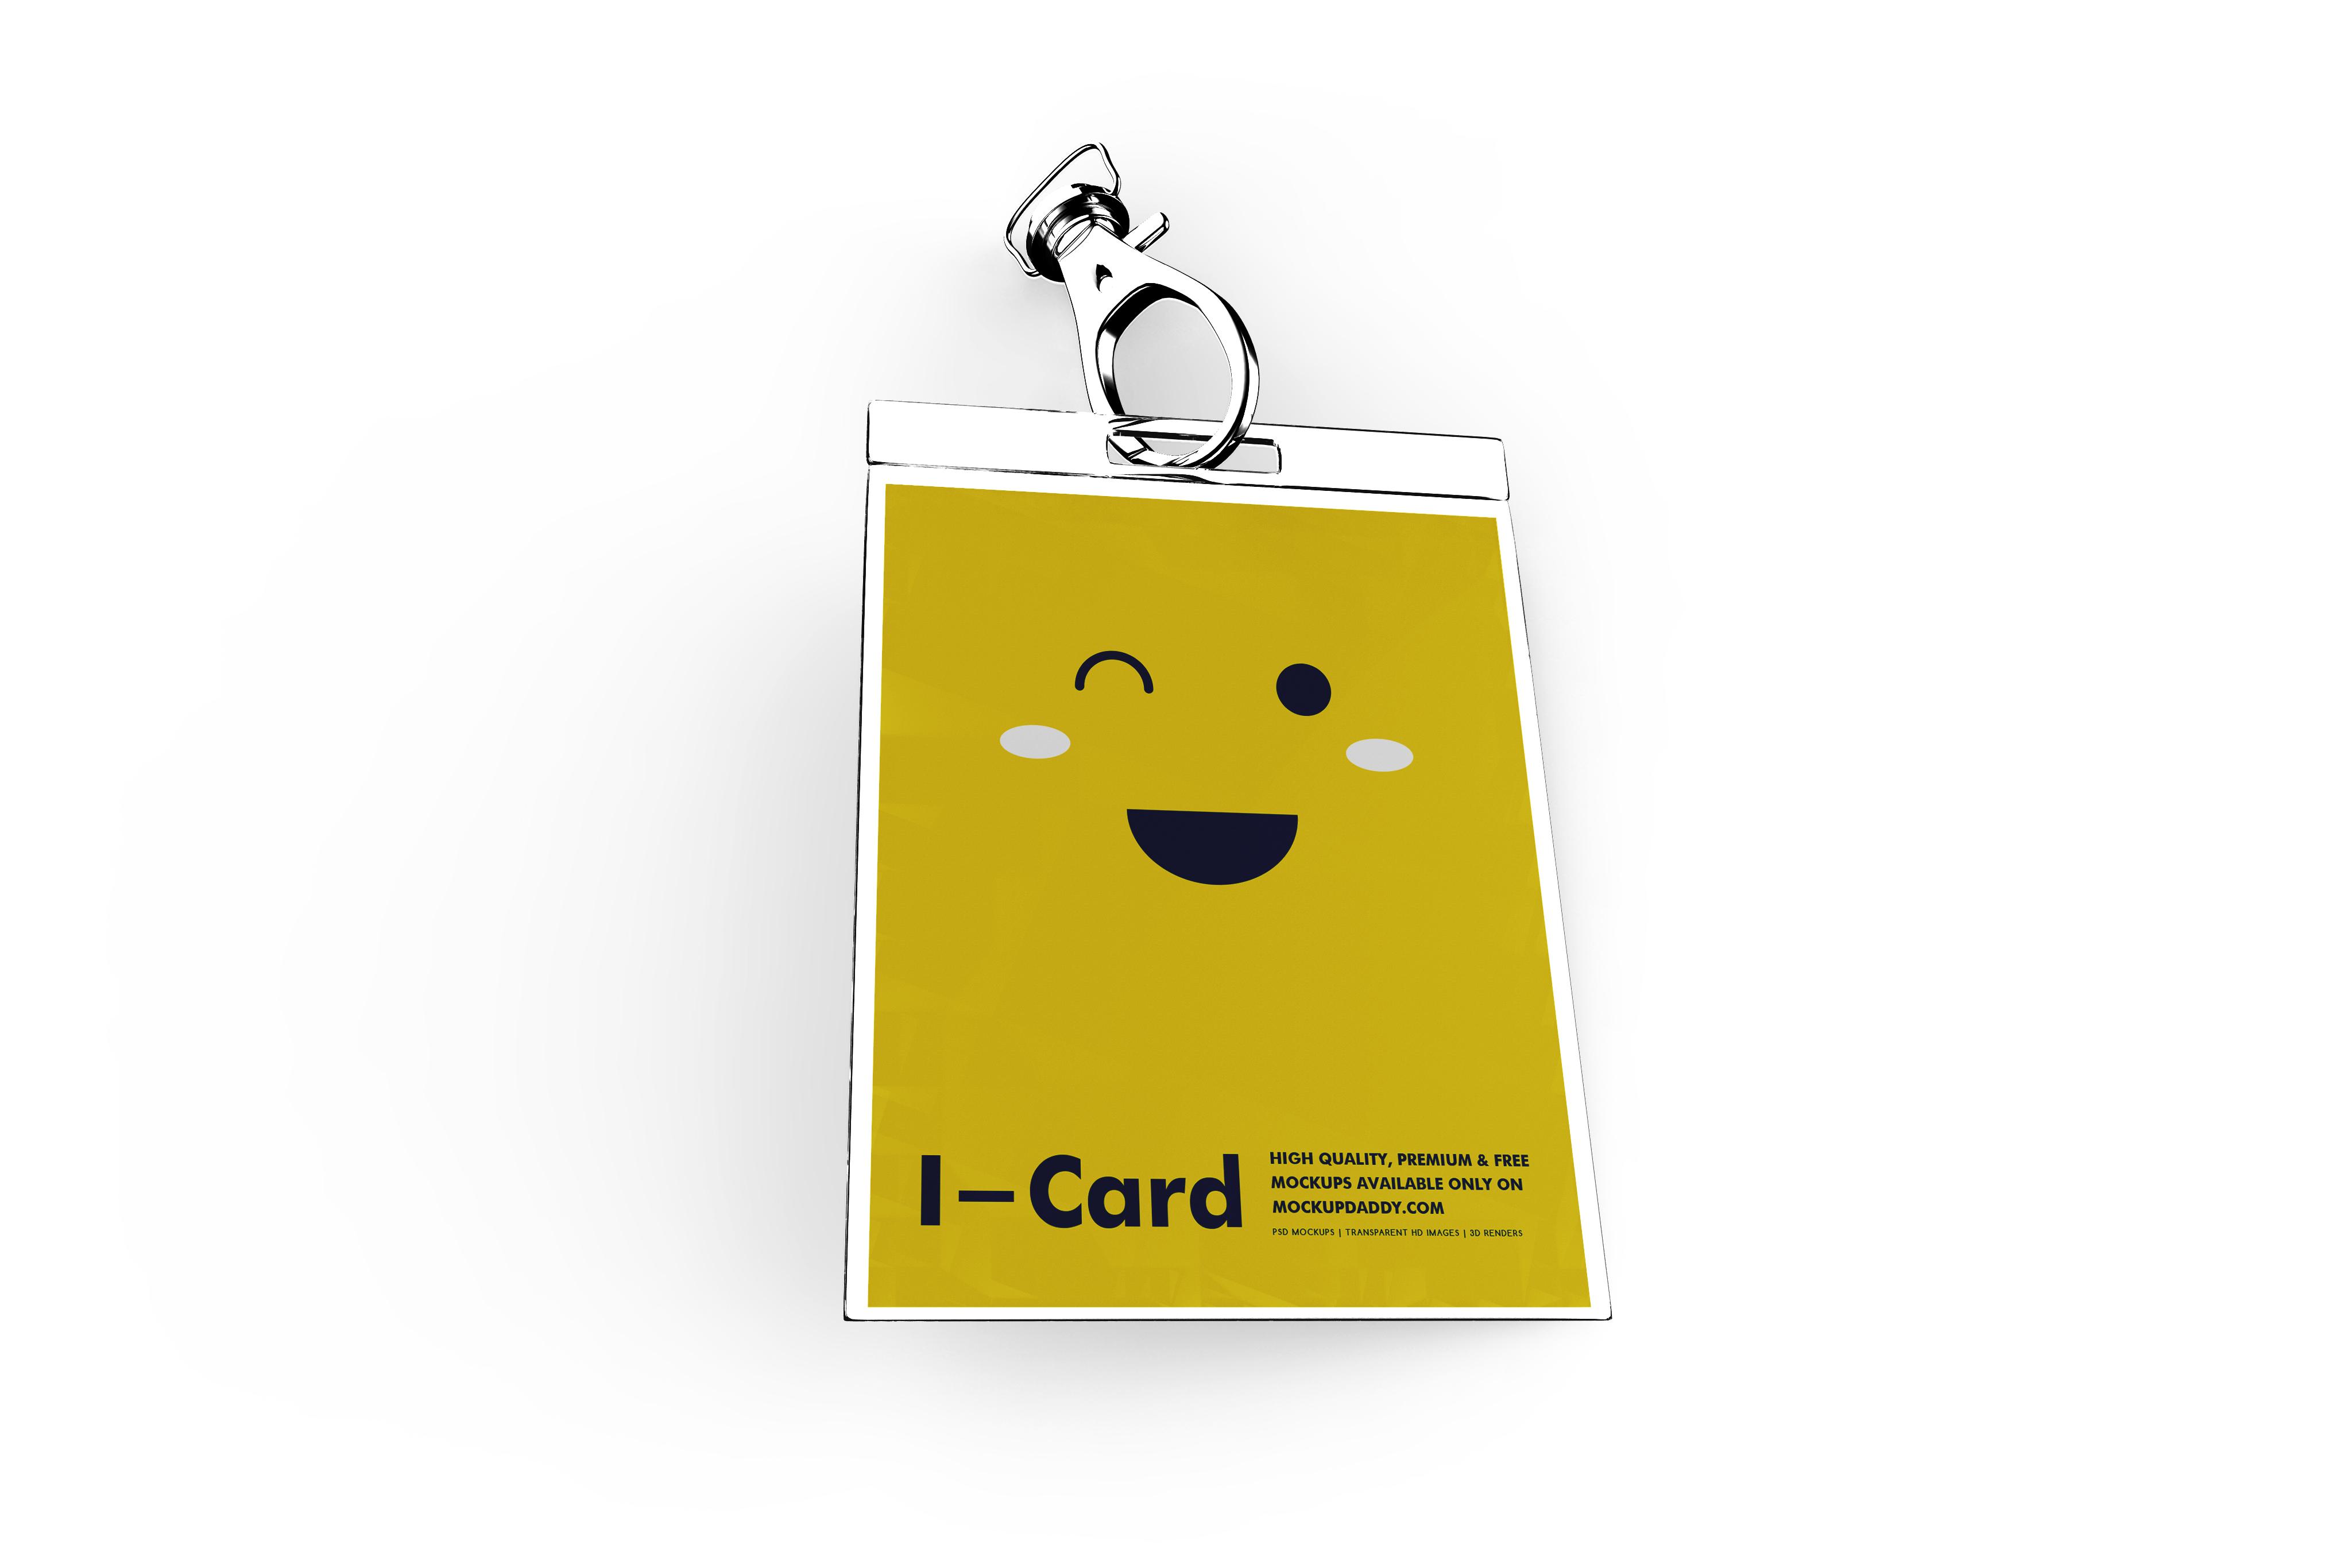 Id Card Mockup Free - Mockup Daddy